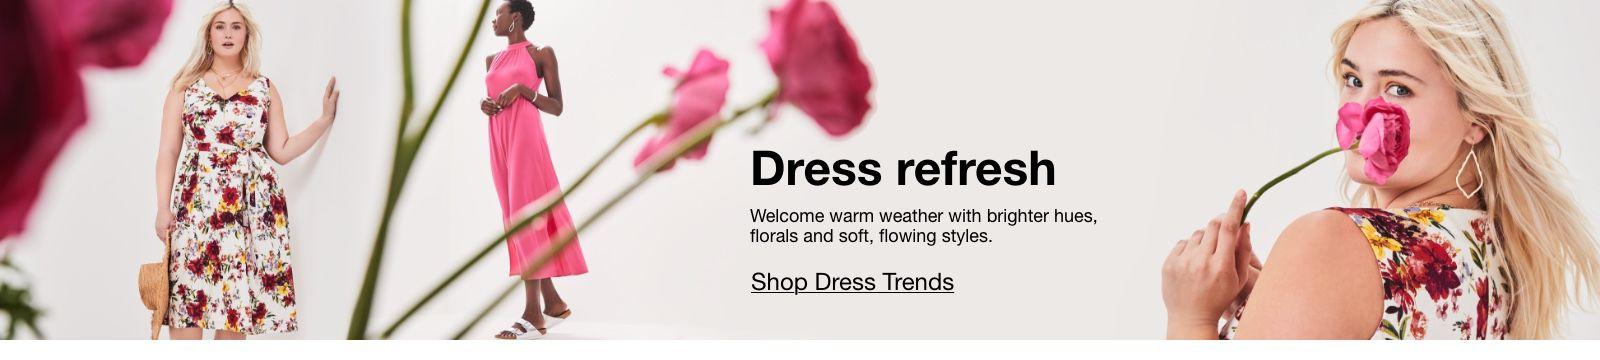 Dress refresh